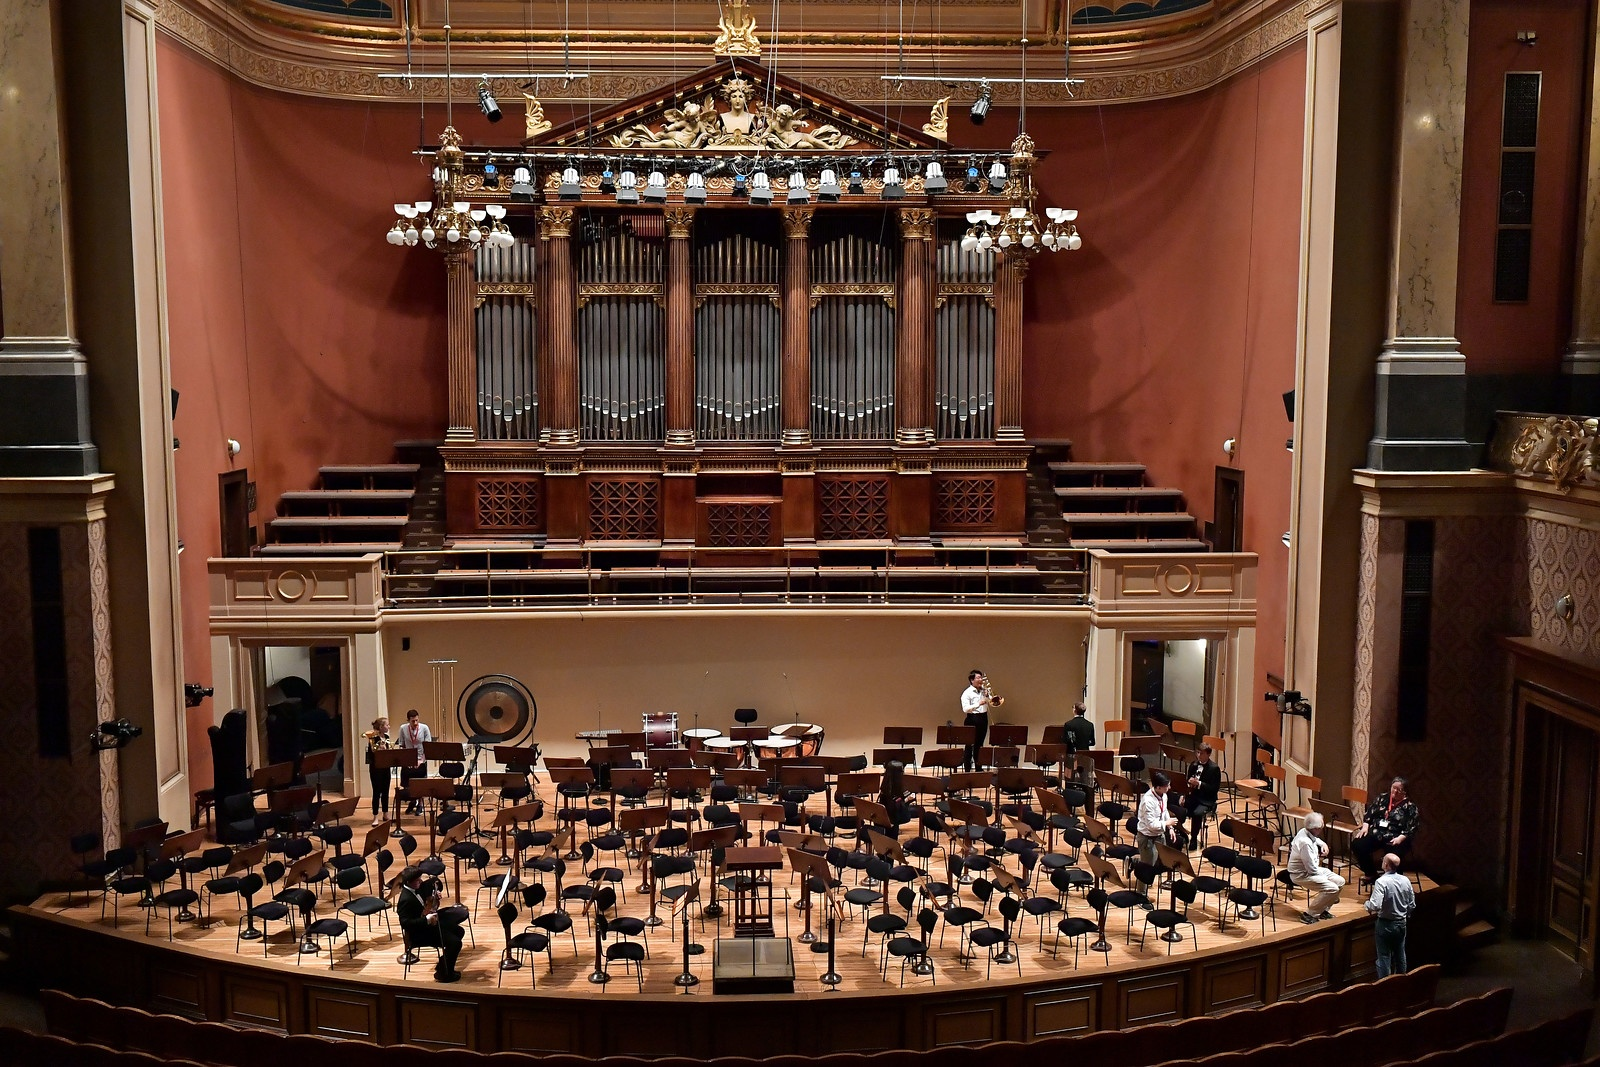 FY18 BPYO Tour - Rudolfinum empty stage (credit - Paul Marotta)